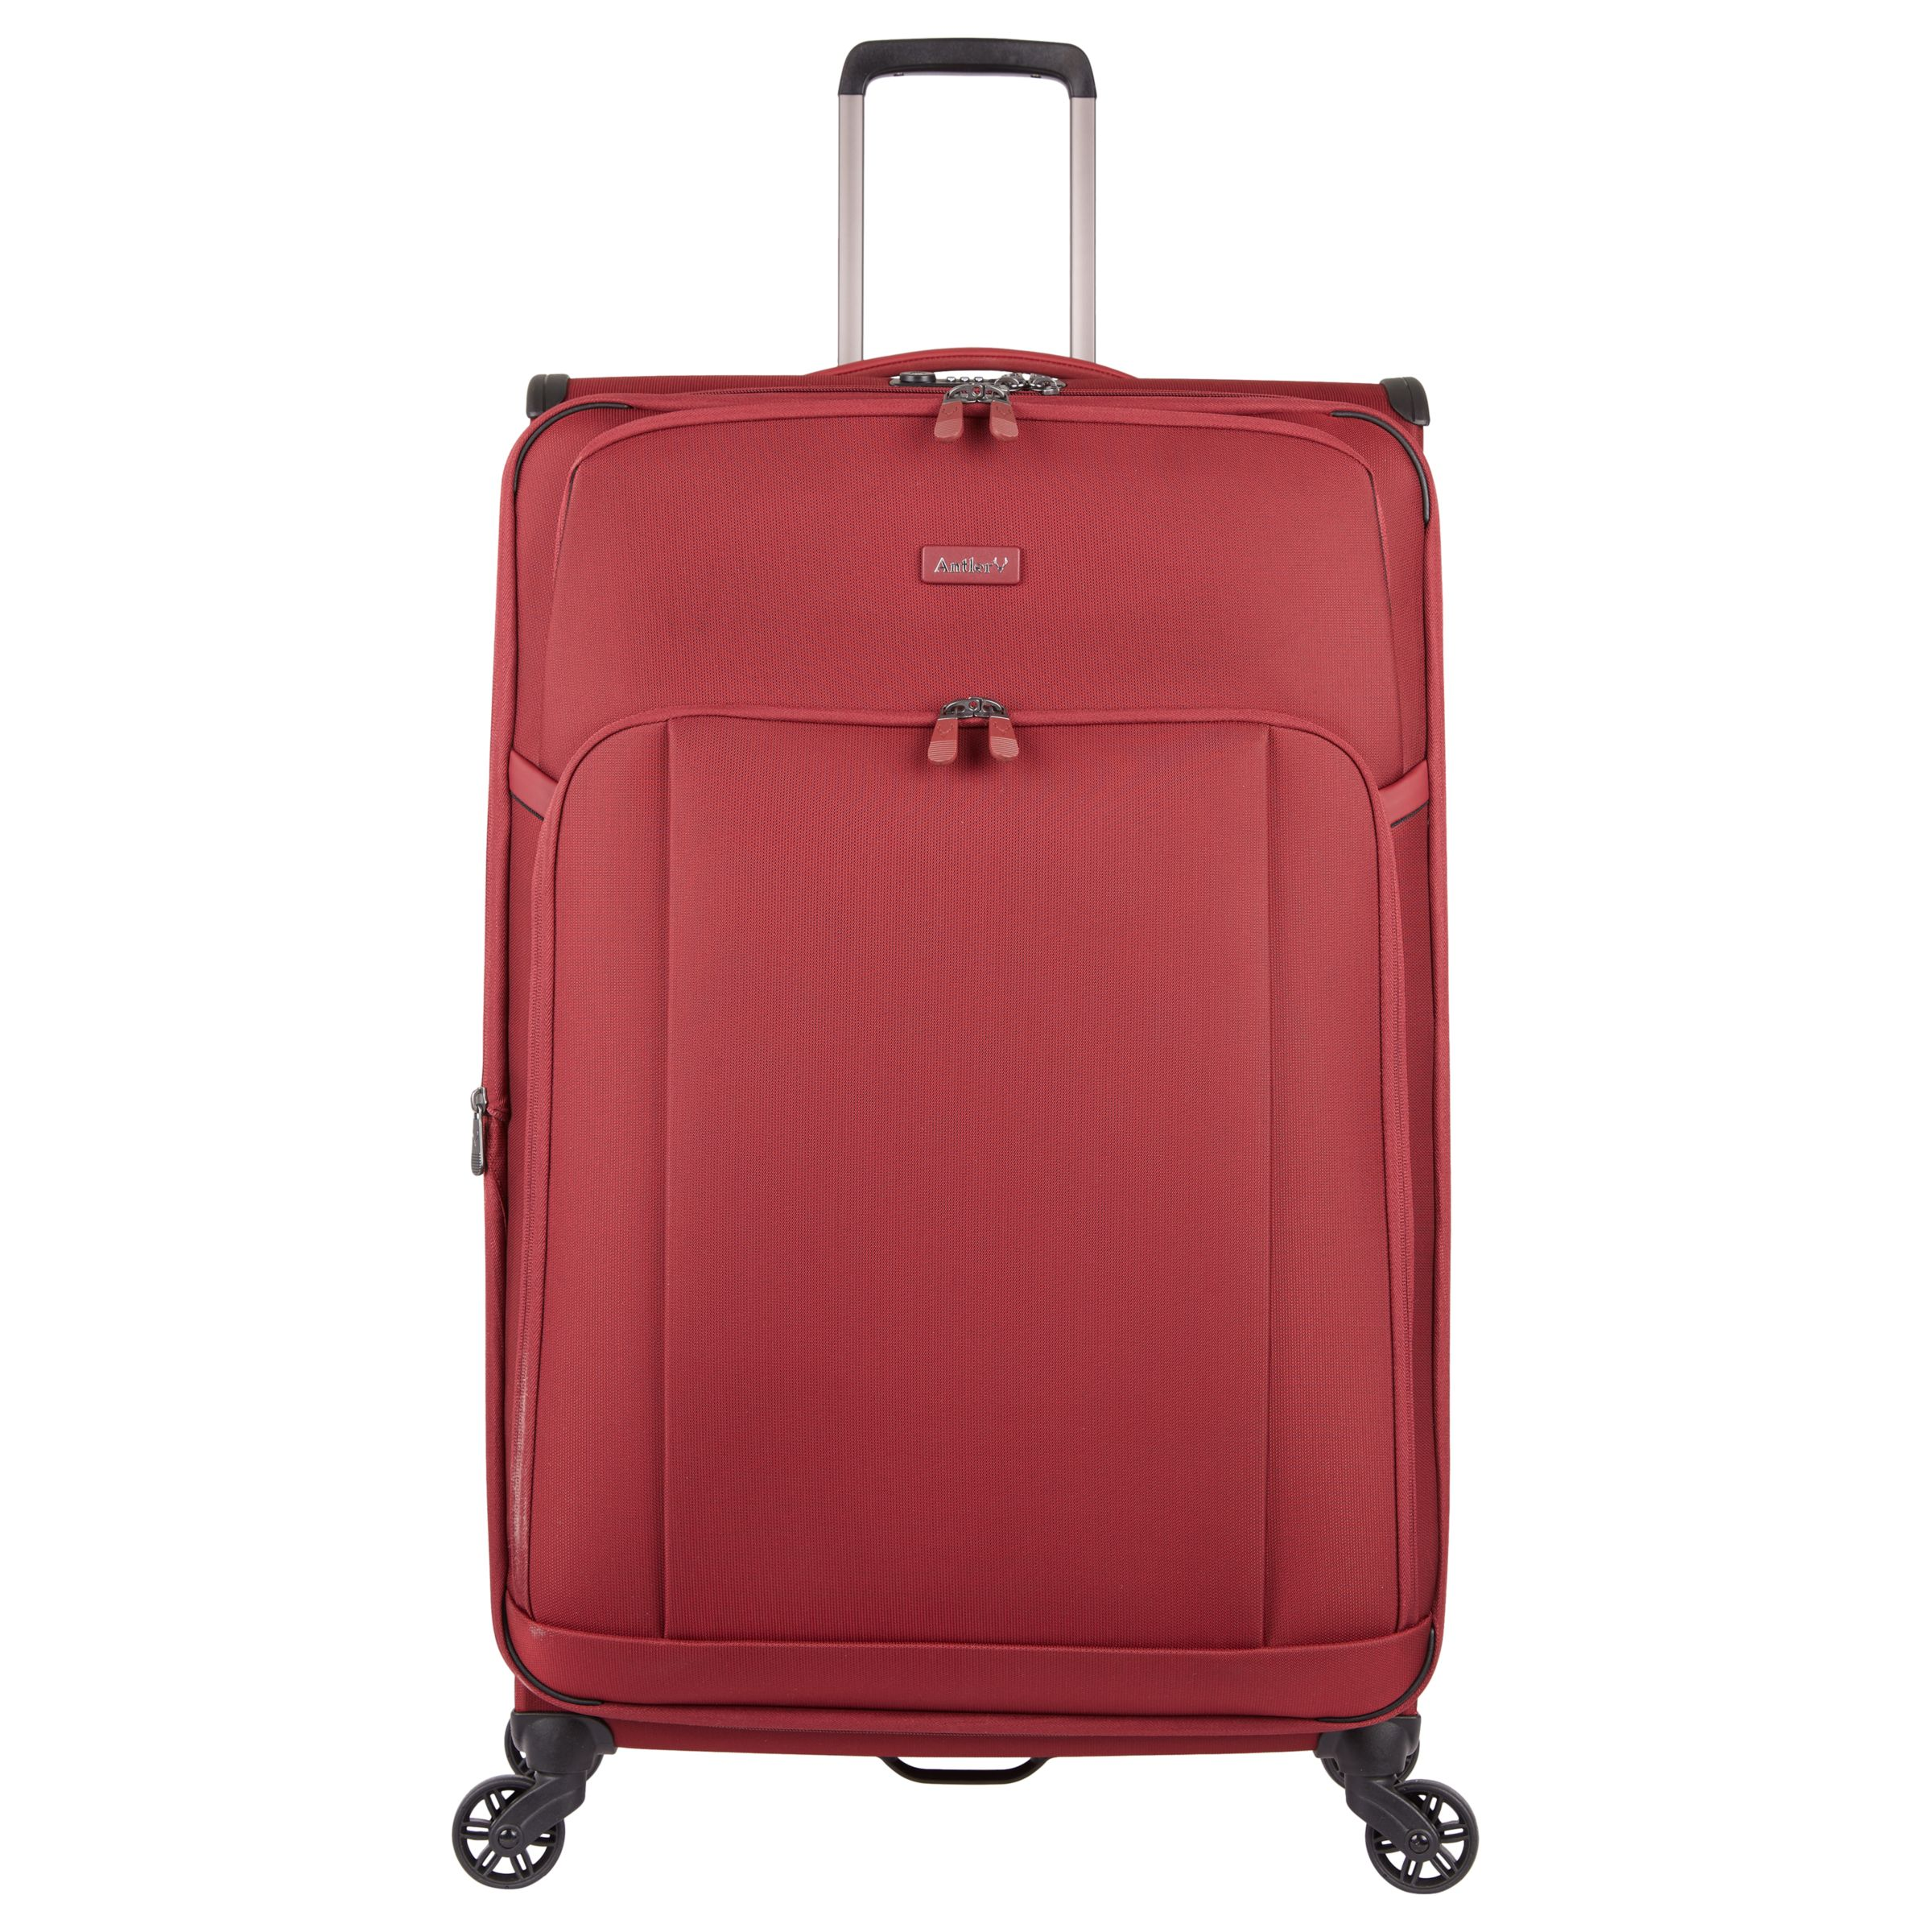 Antler Antler Atmosphere 82cm 4-Wheel Large Suitcase